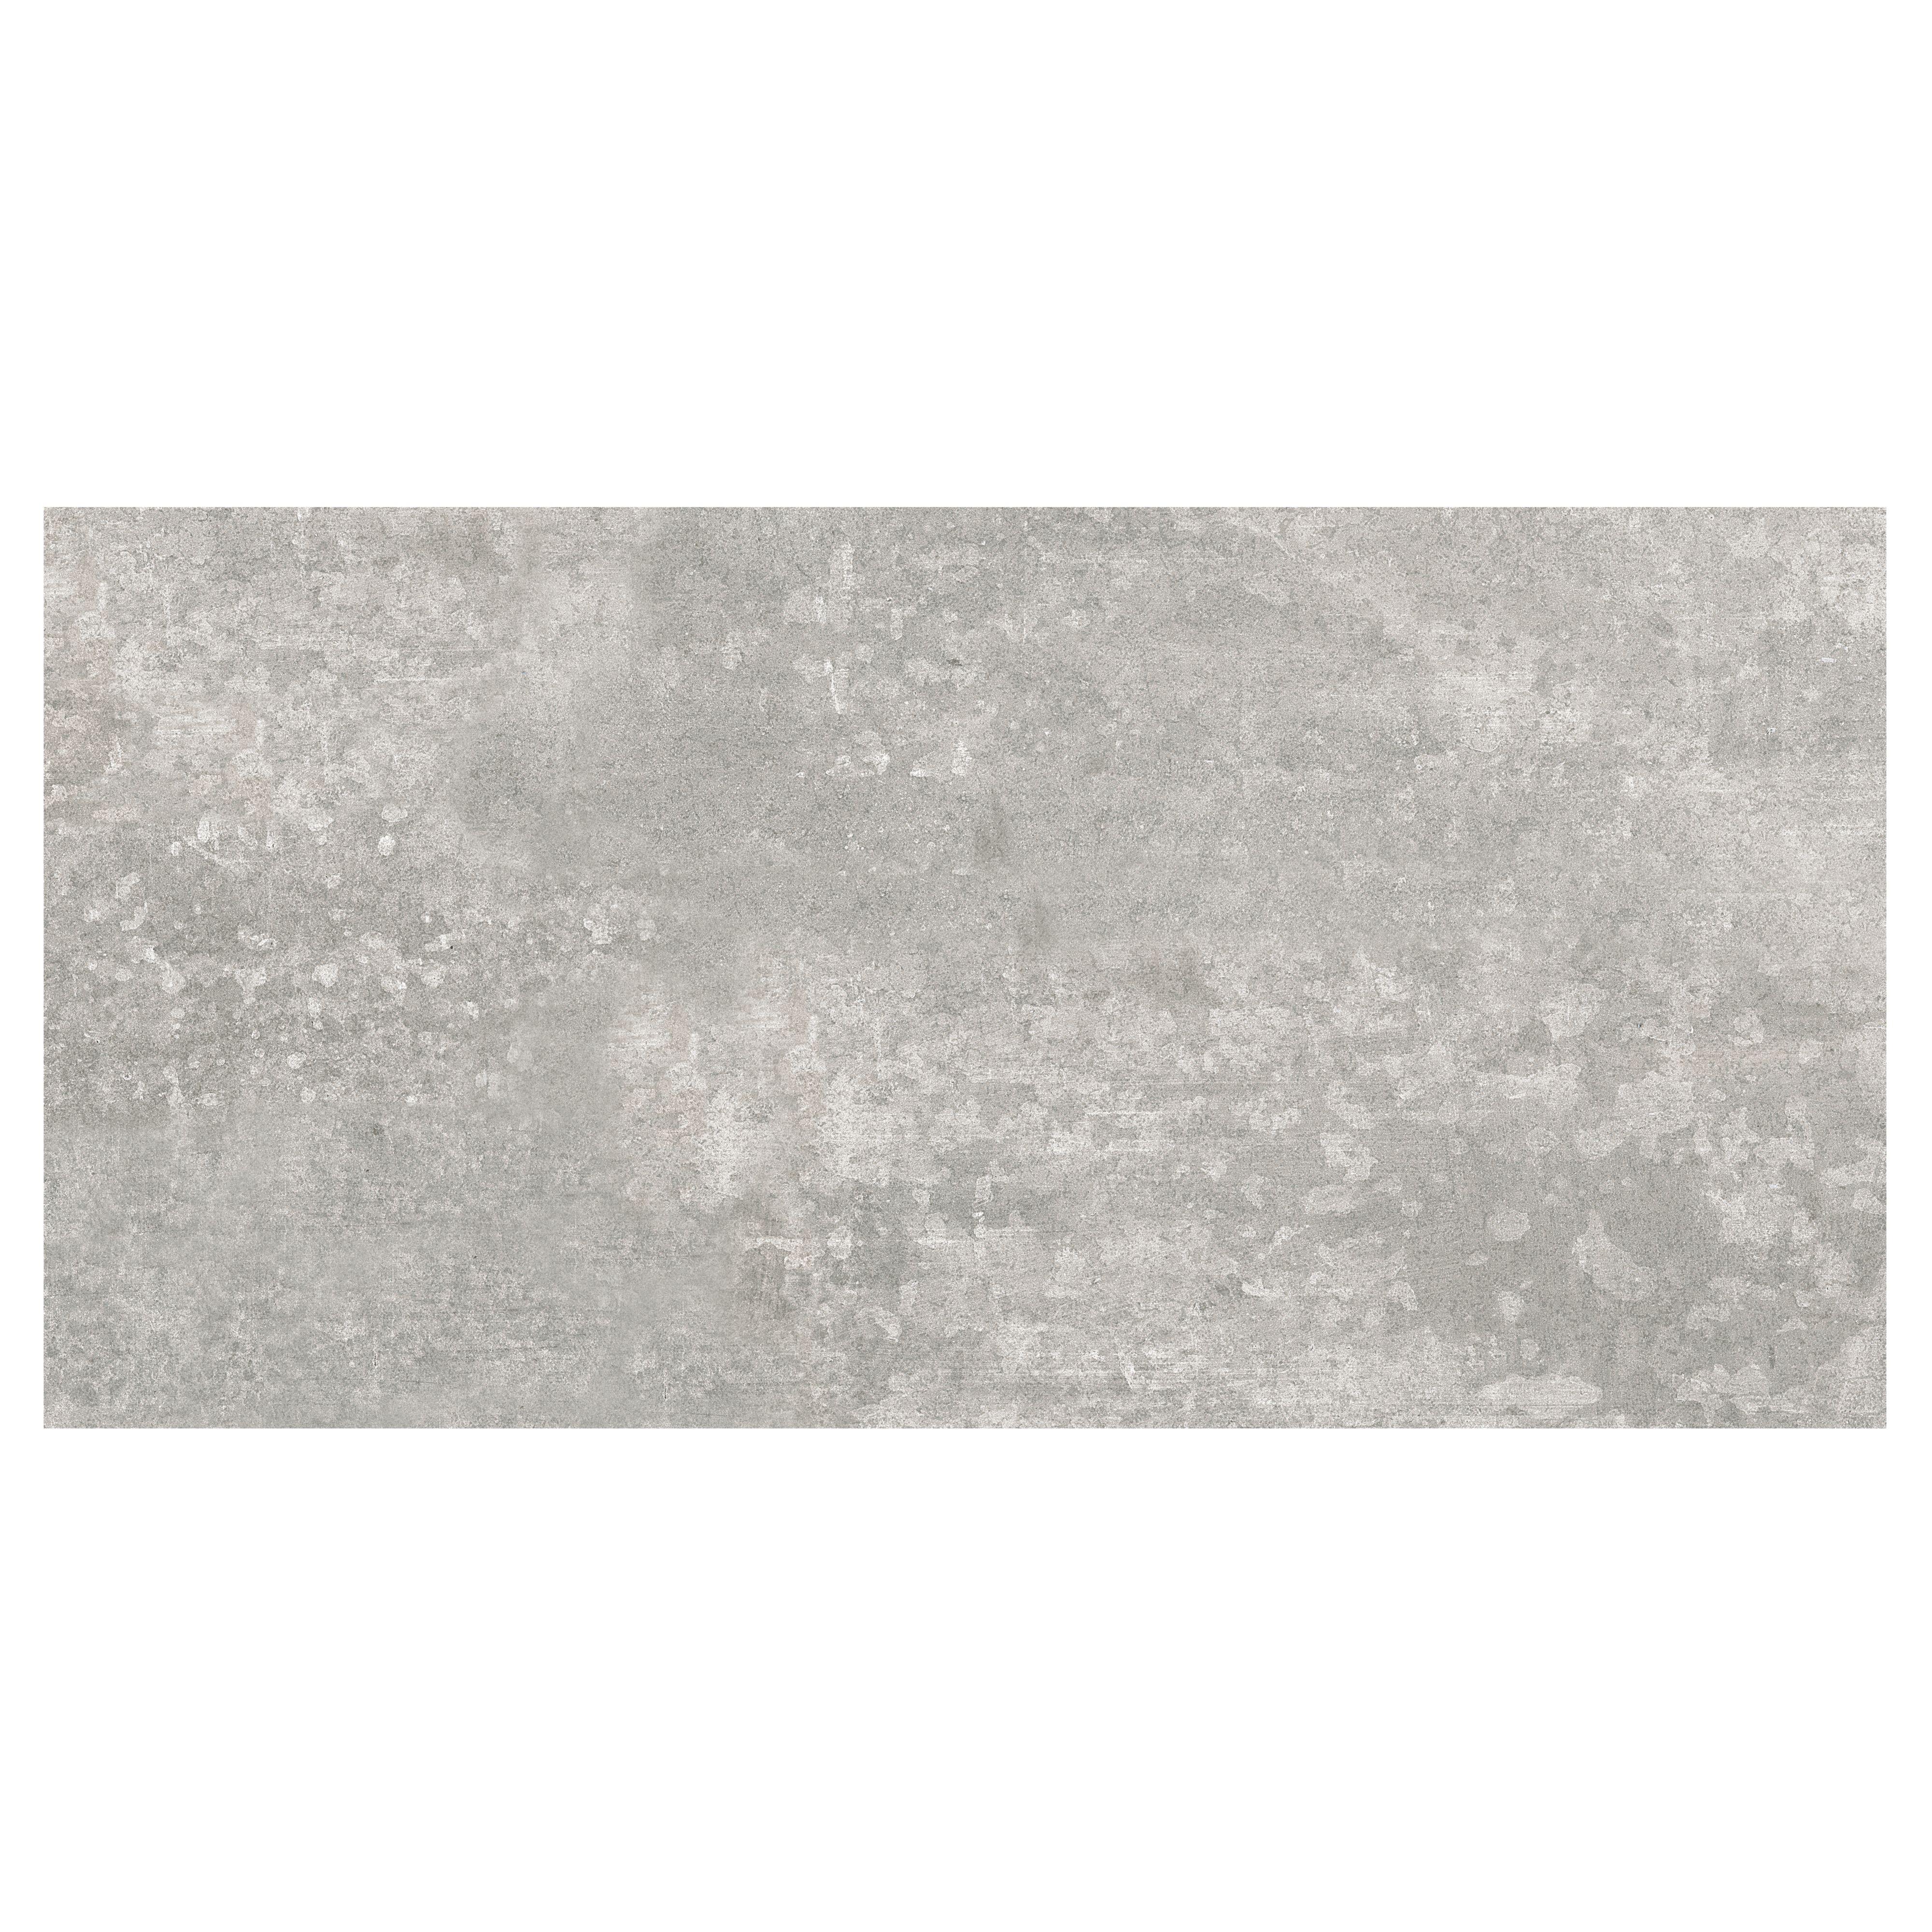 urban grey matt ceramic wall floor tile pack of 5 l 600mm w 300mm